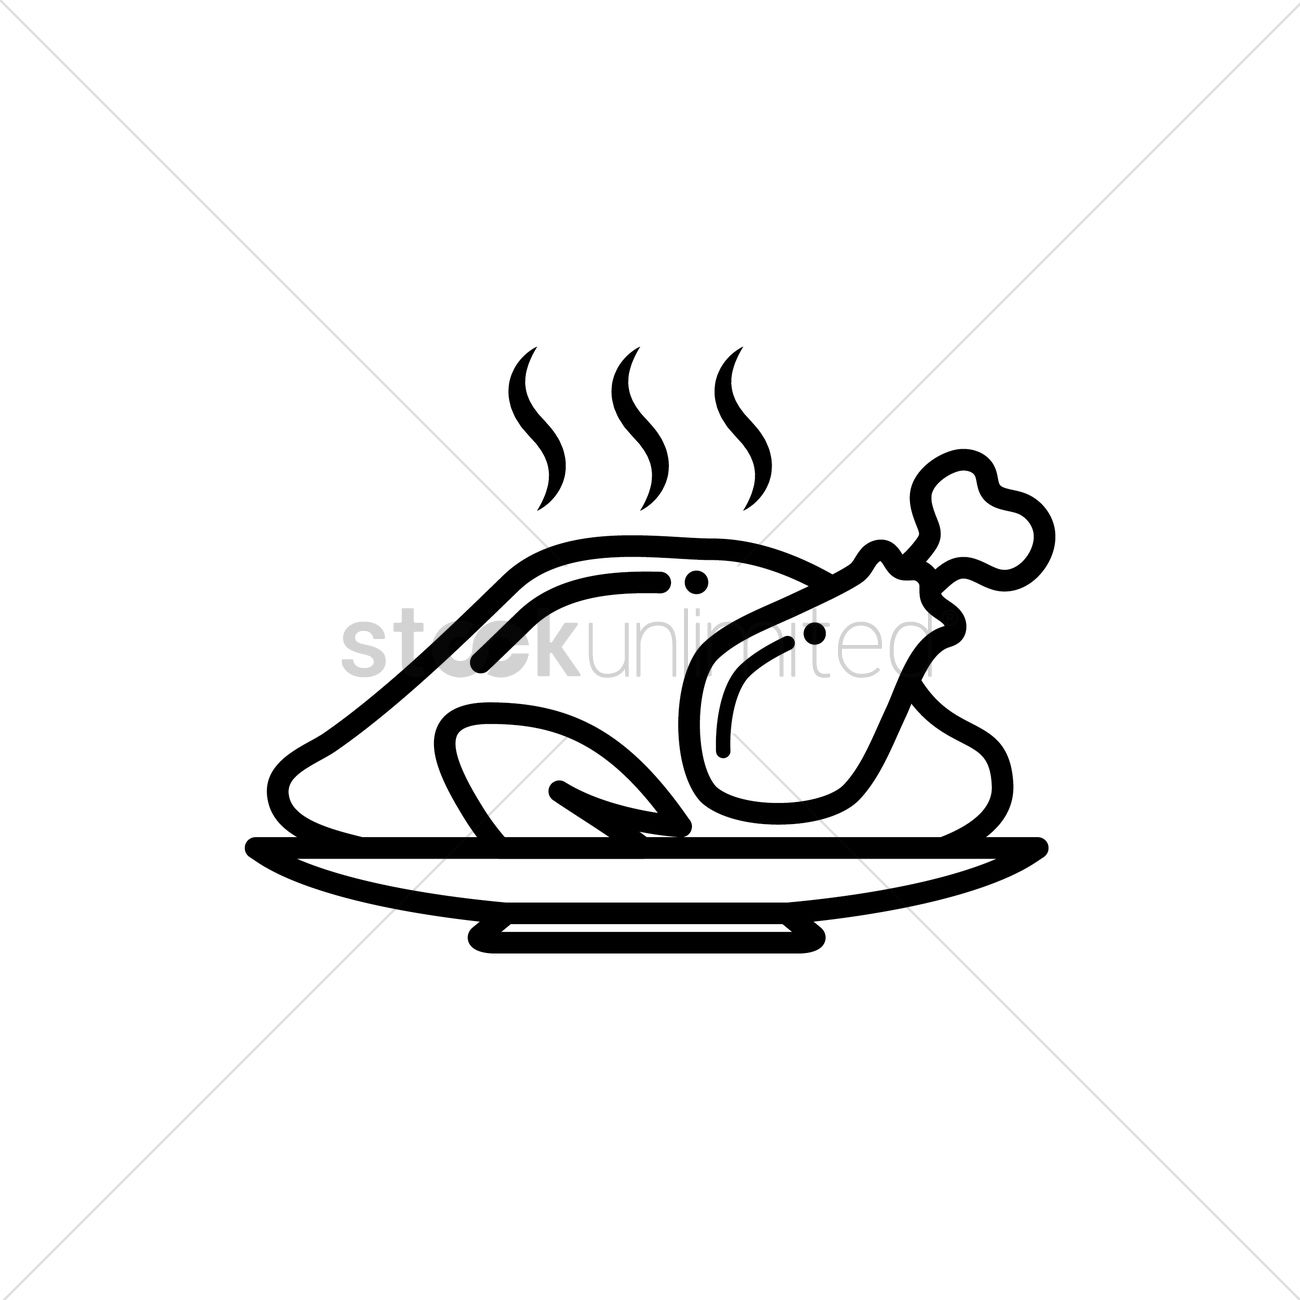 Roast Chicken High-Res Vector Graphic - Getty Images  Roast Chicken Vector